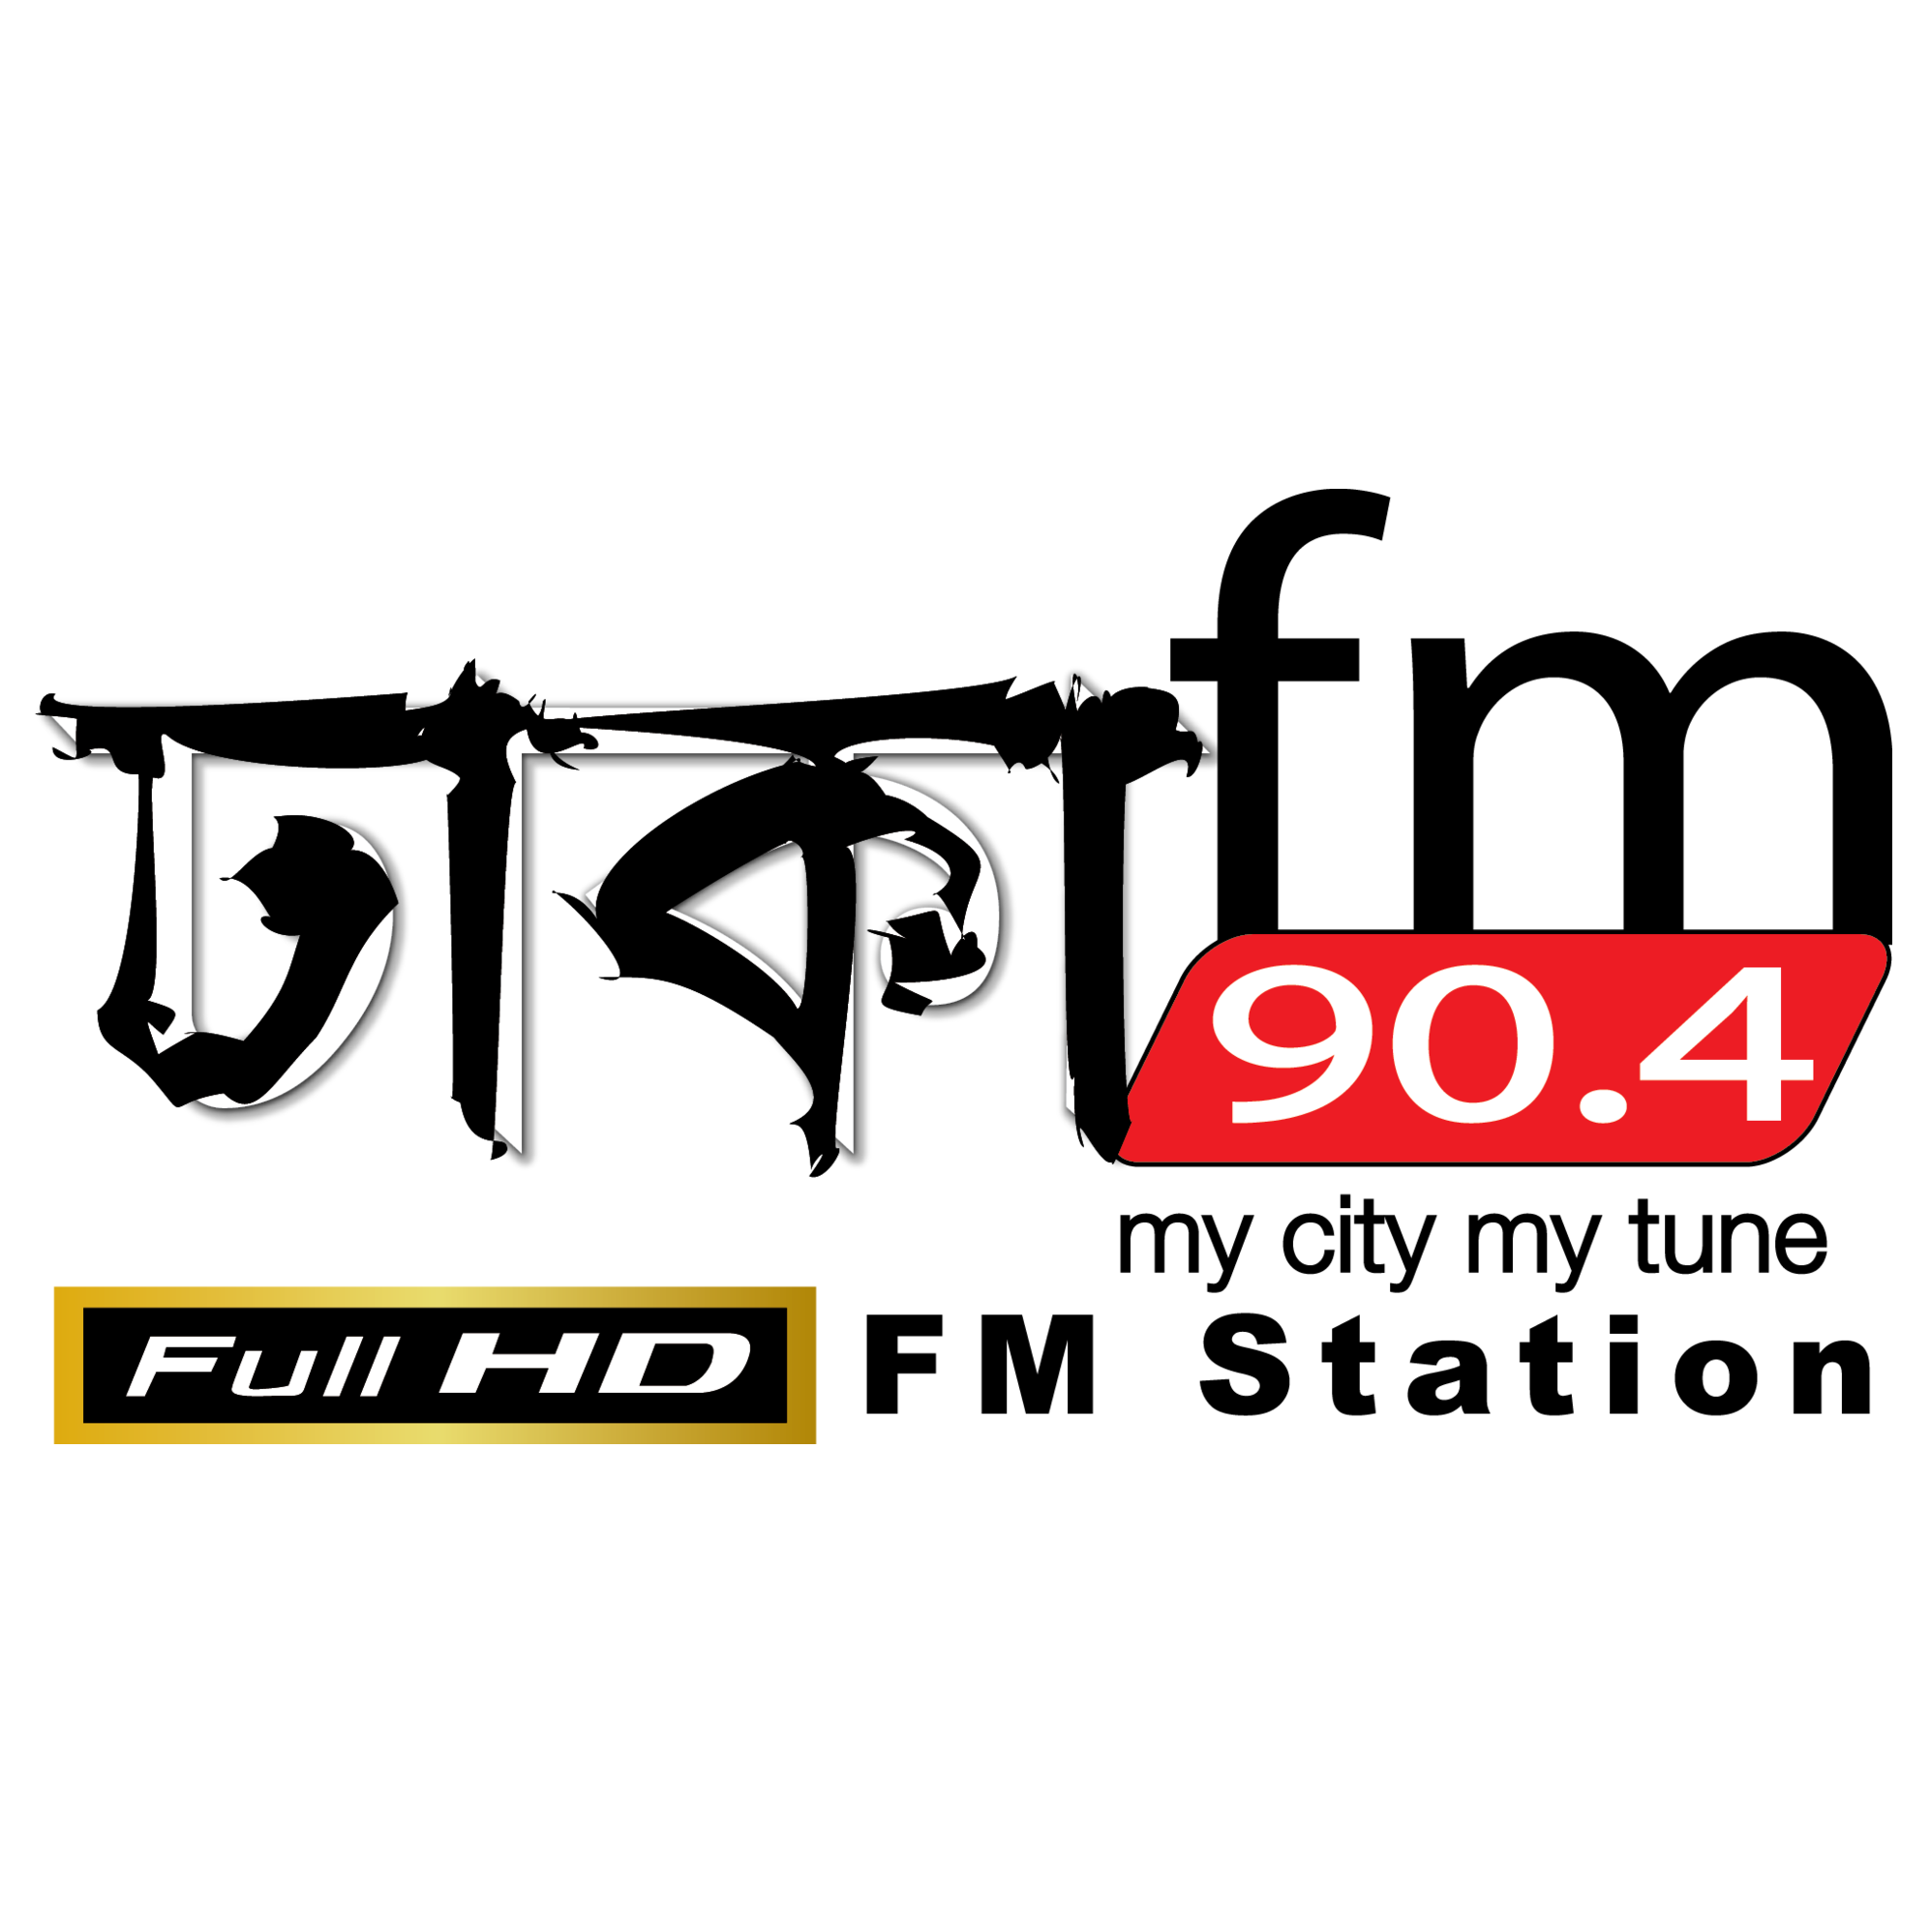 Live Dhaka Fm